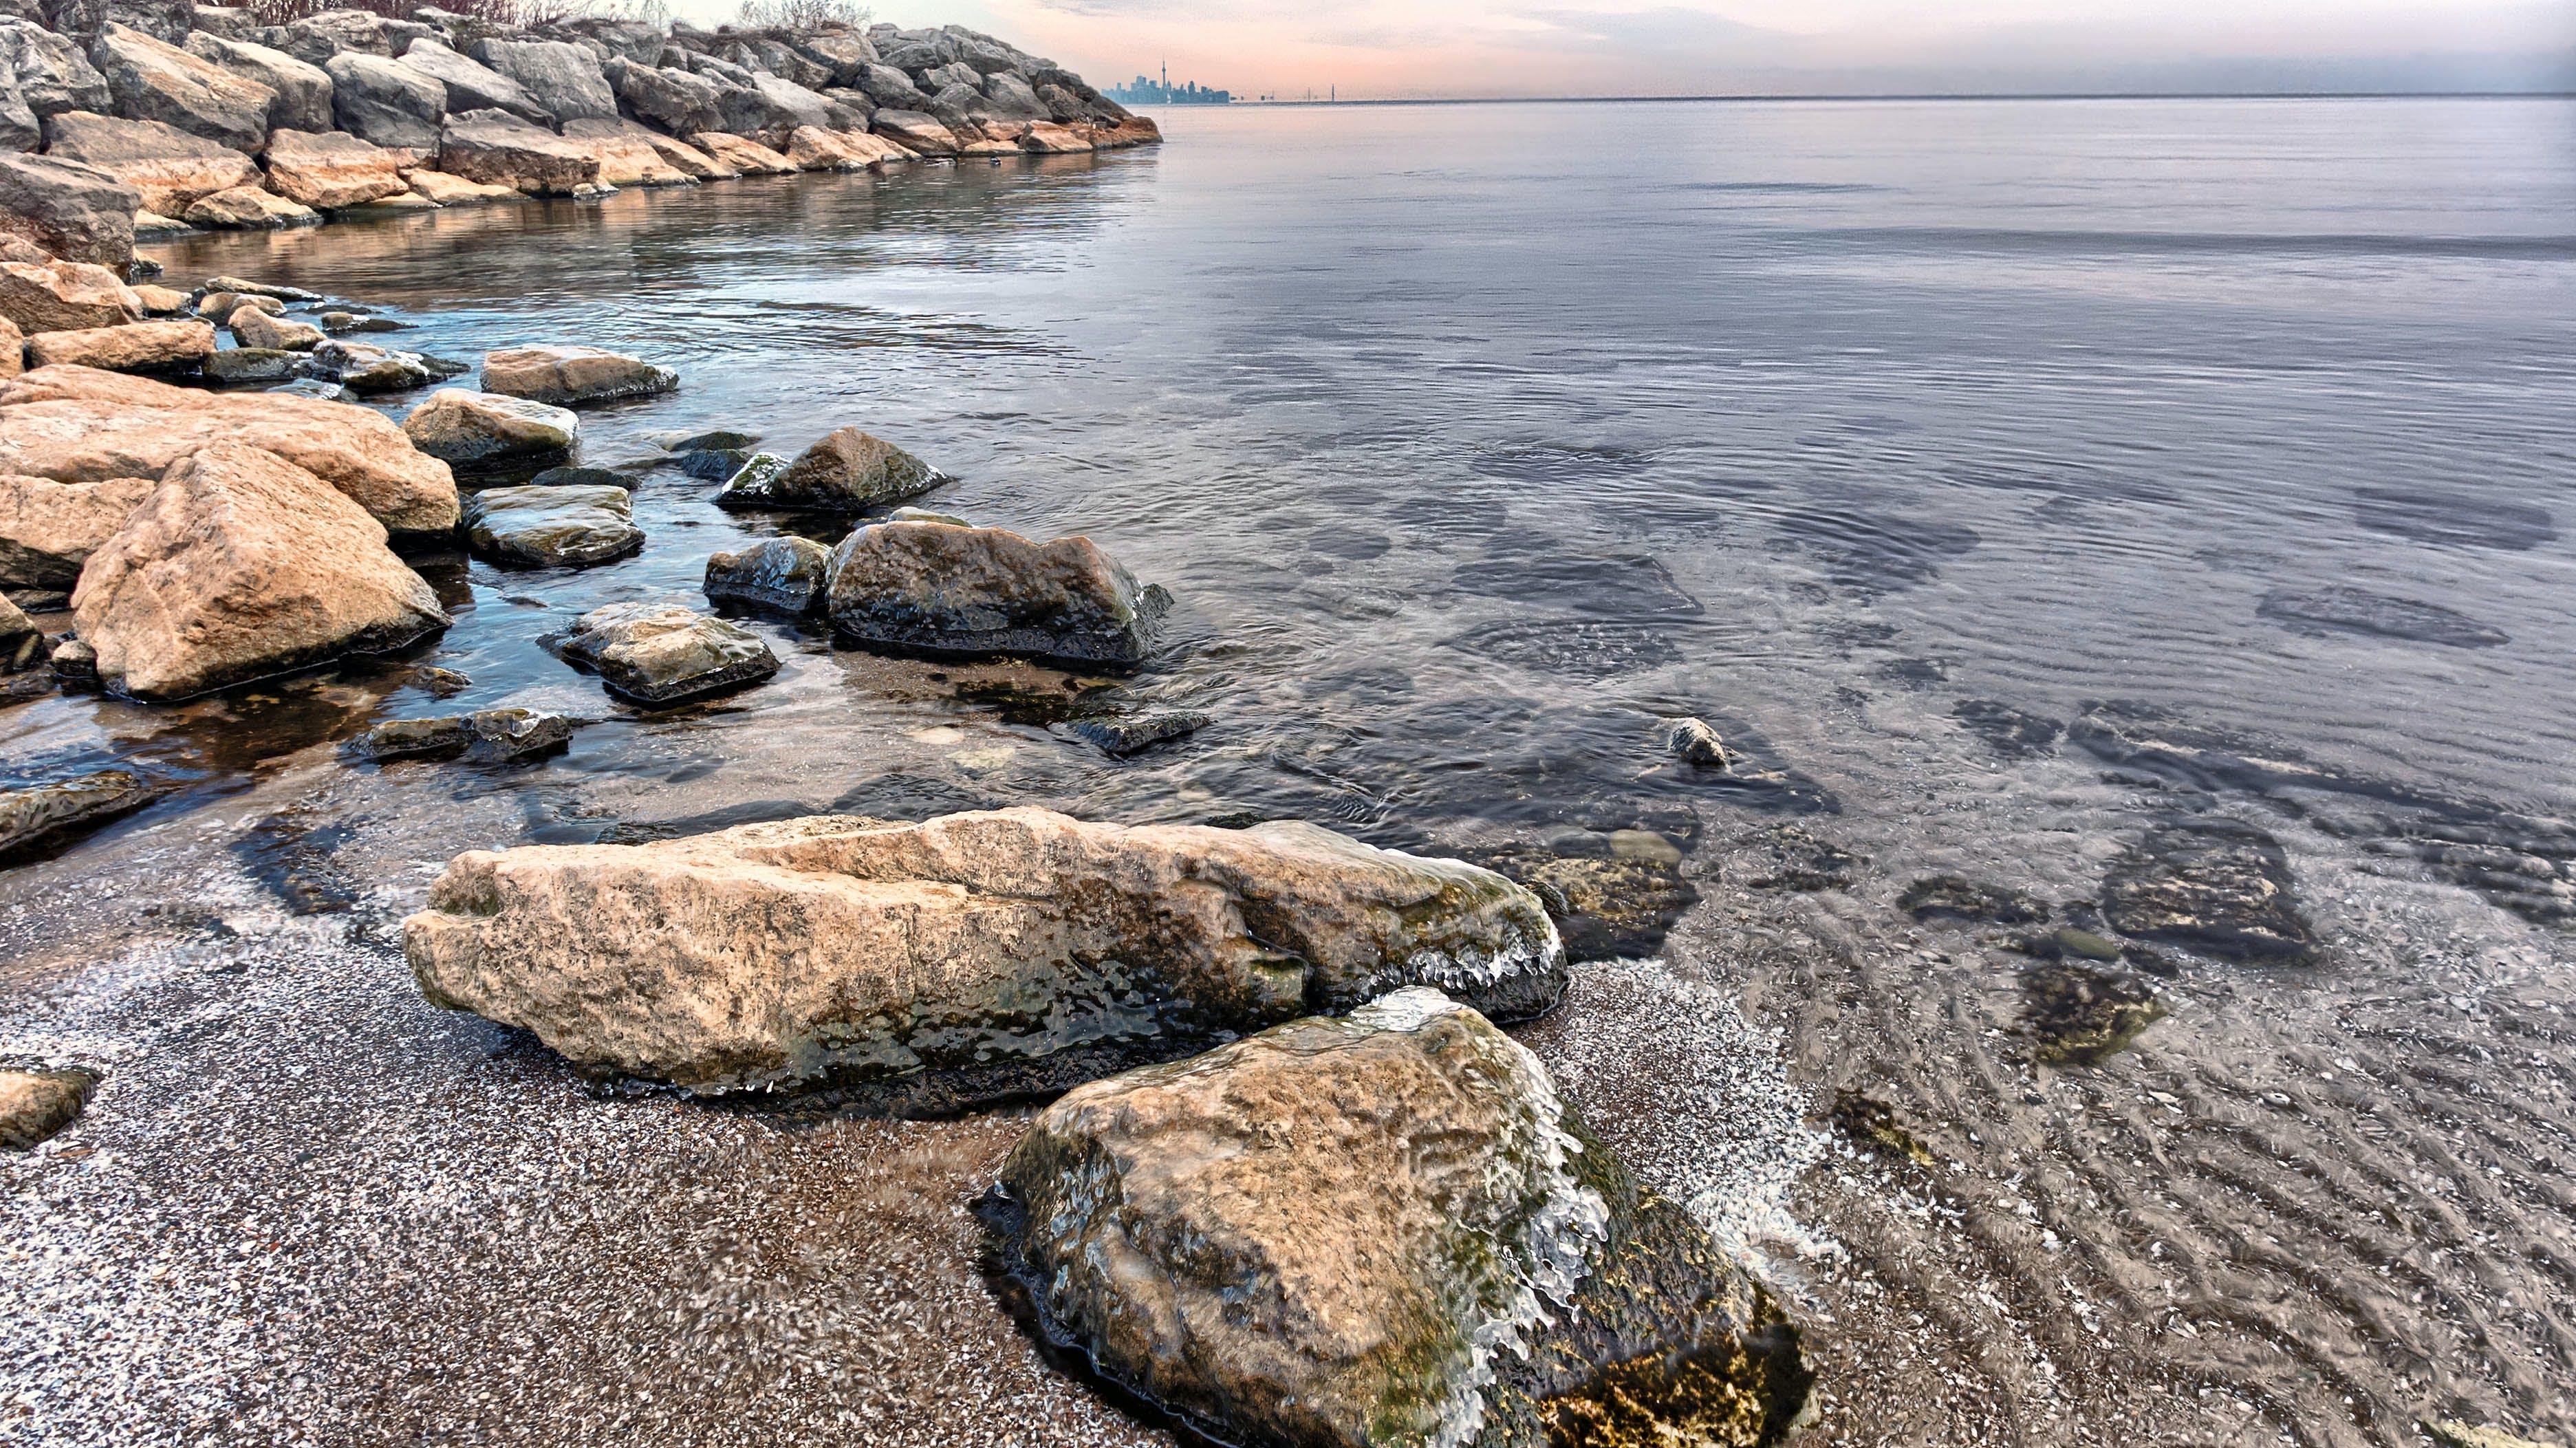 Gray and Blue Seashore